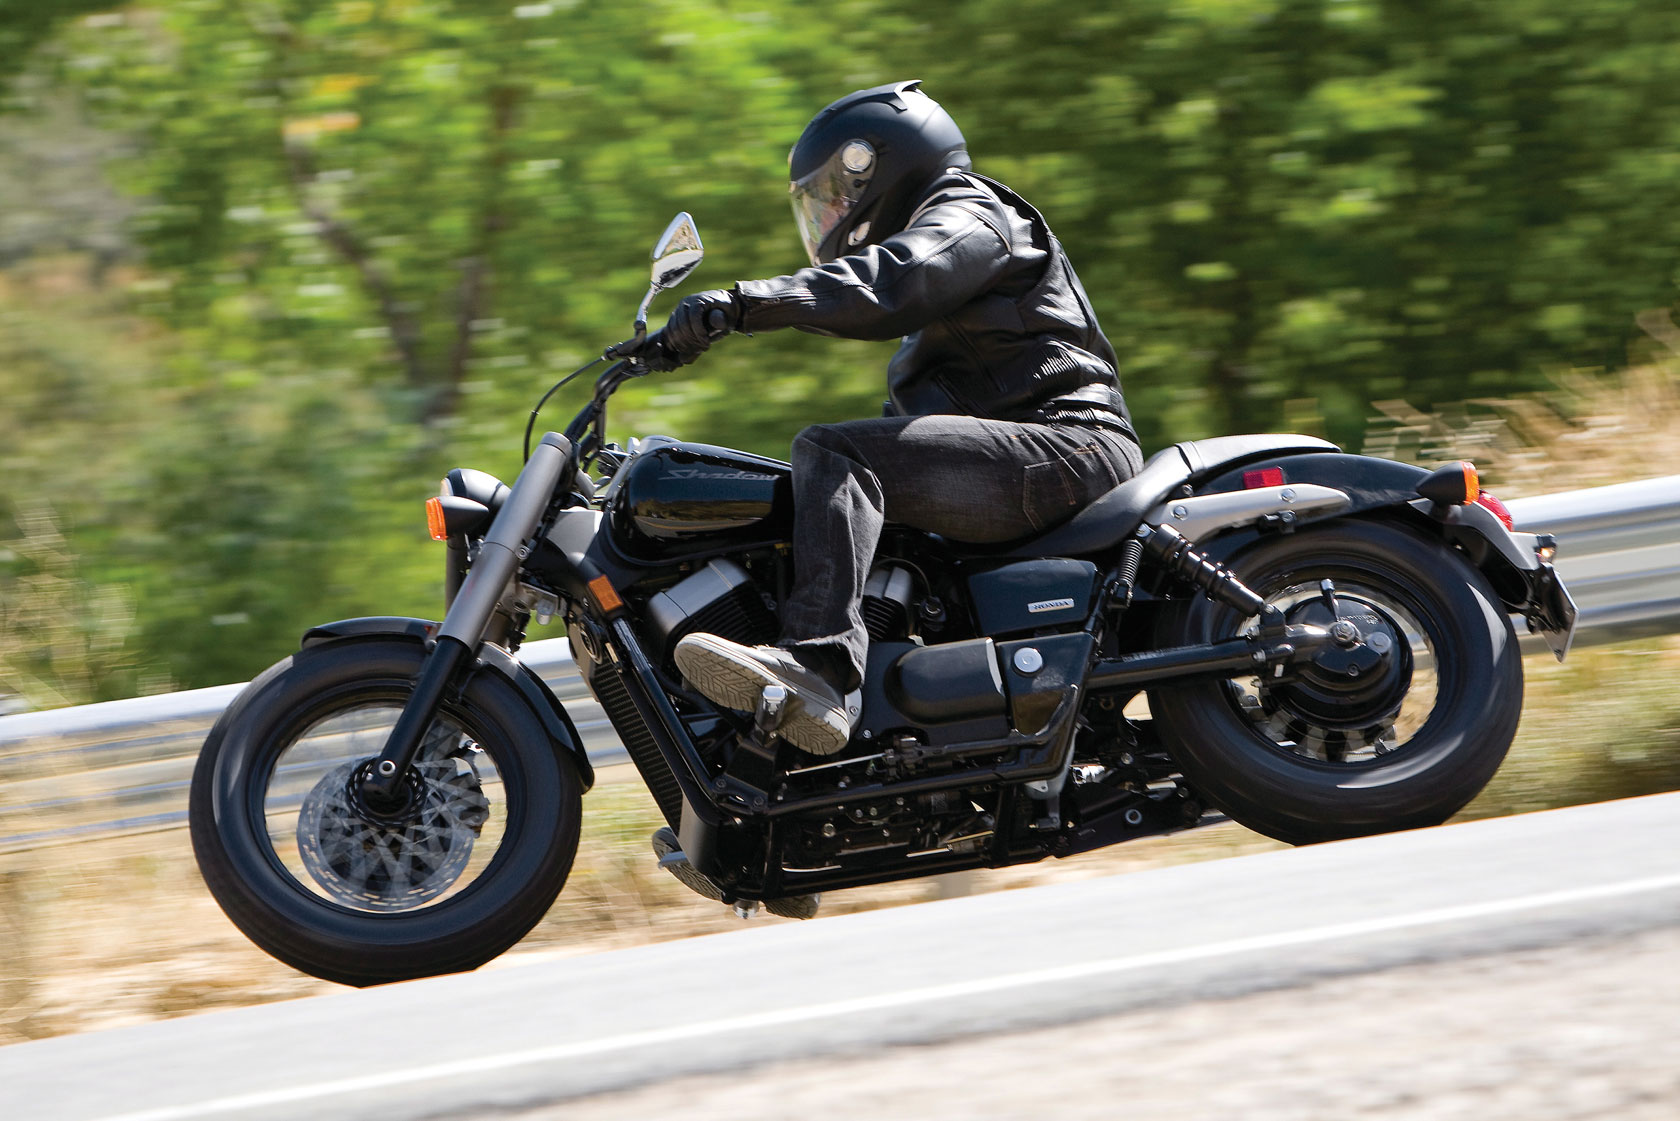 Hondashadowphantomvt C A on New Engine Water Cooled Harley